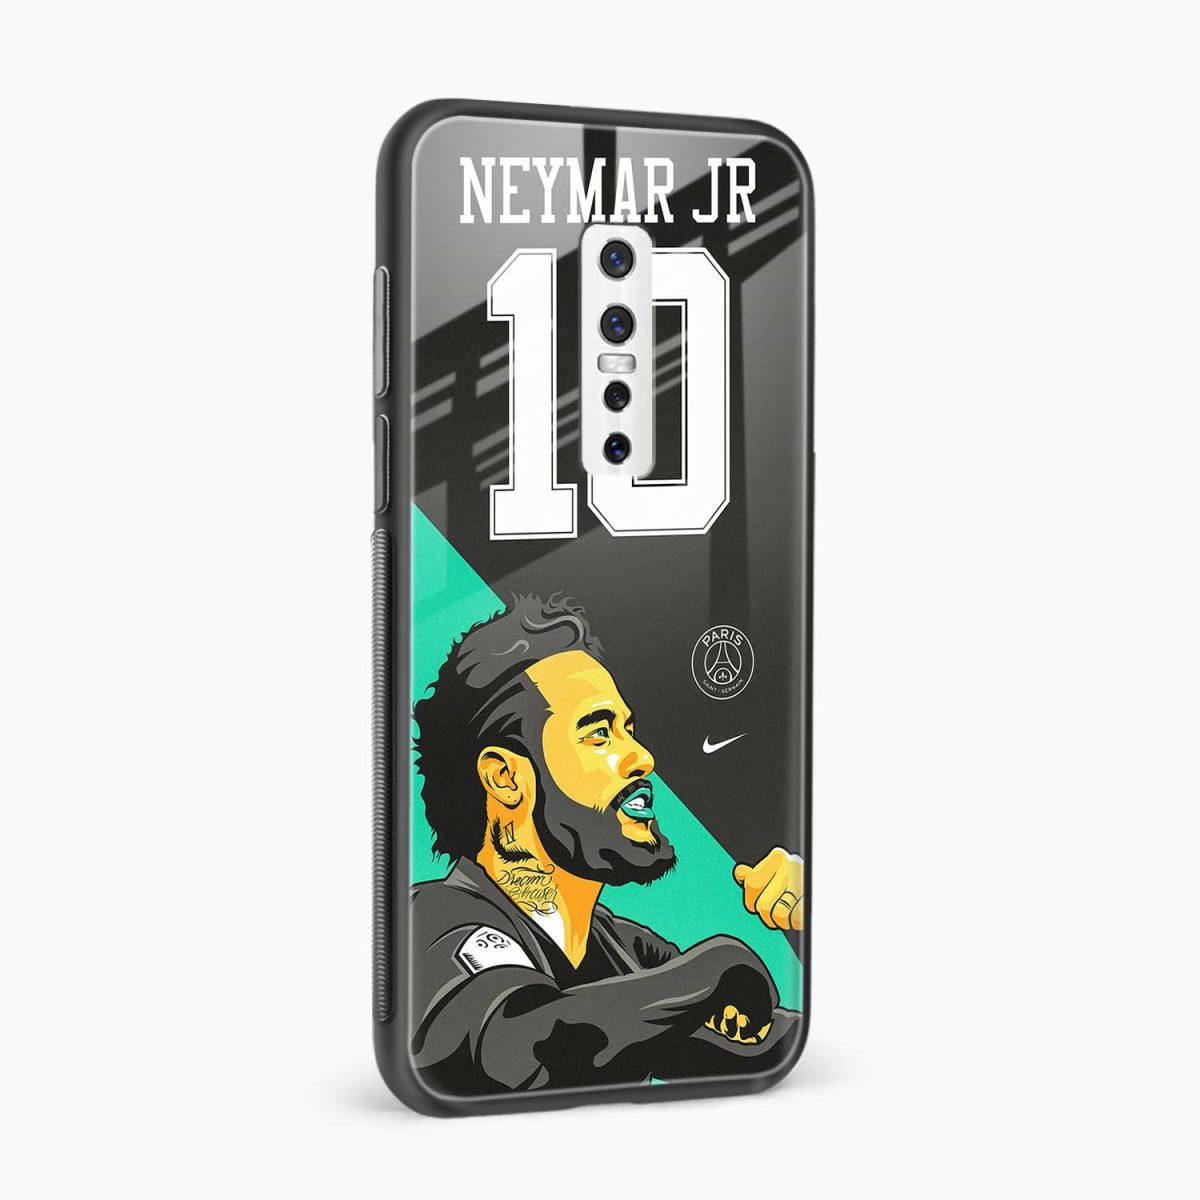 neymar jr 10 side view vivo v17 plug back cover